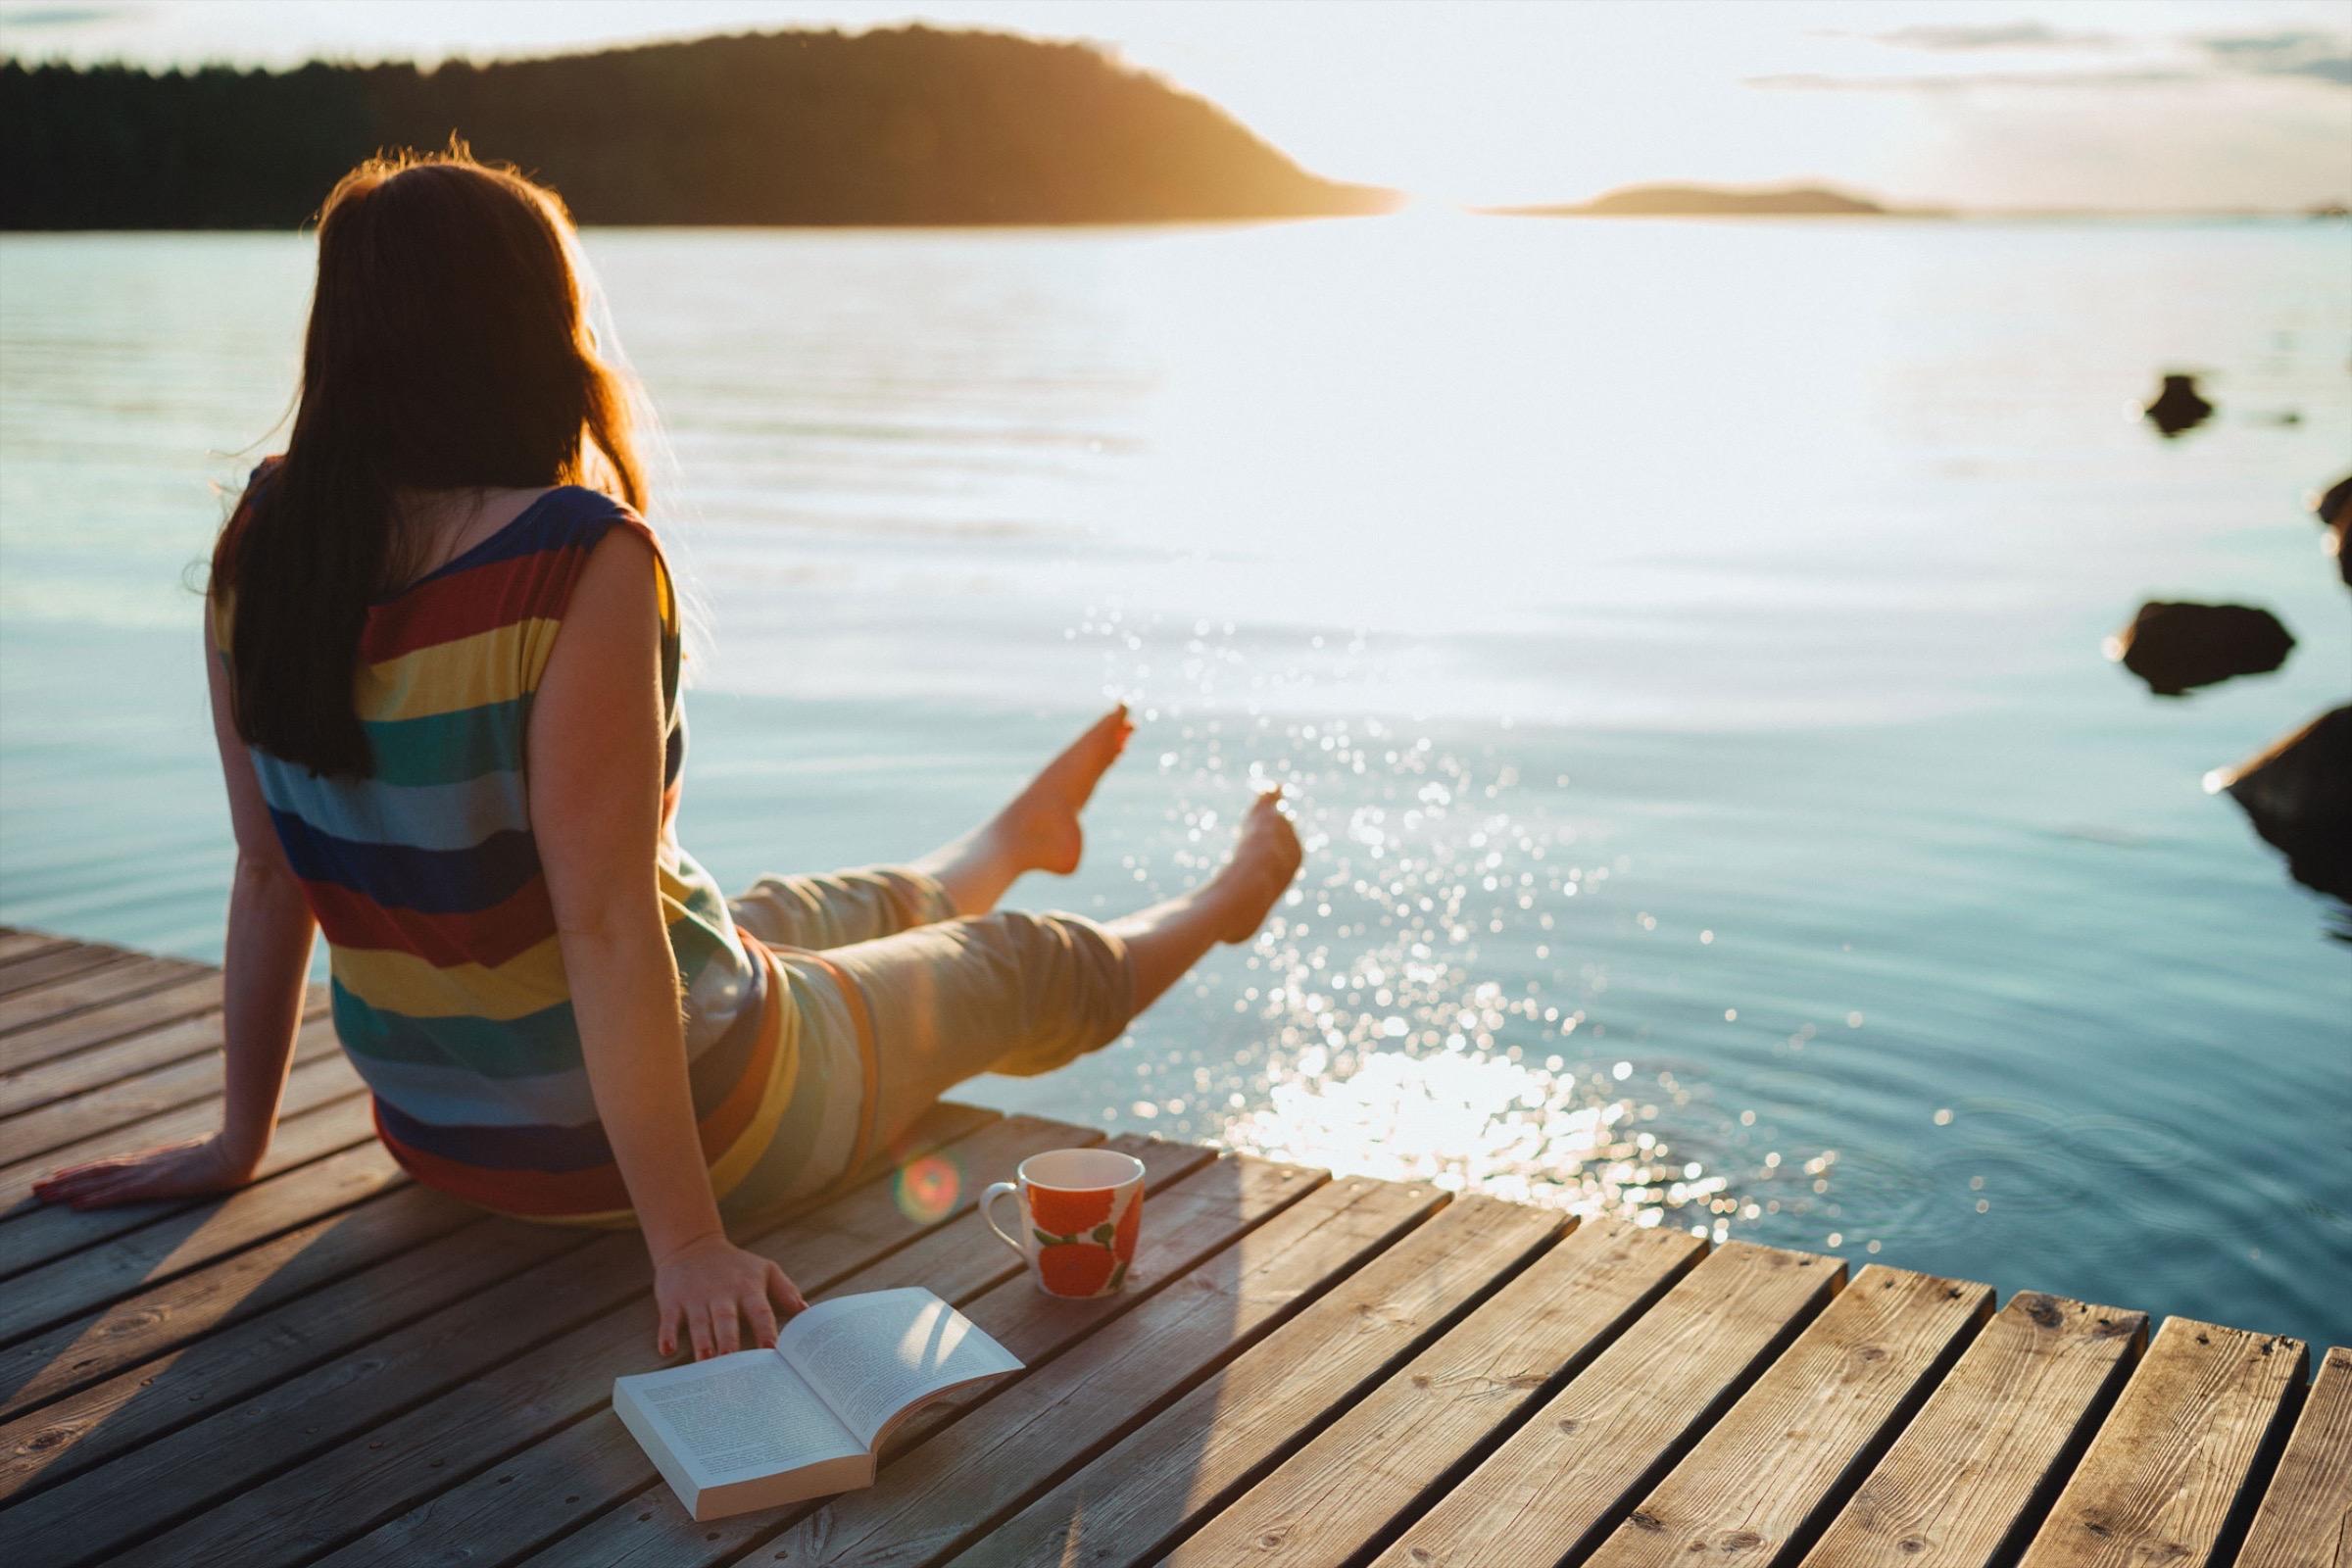 девушка сидит на пирсе с книжкой